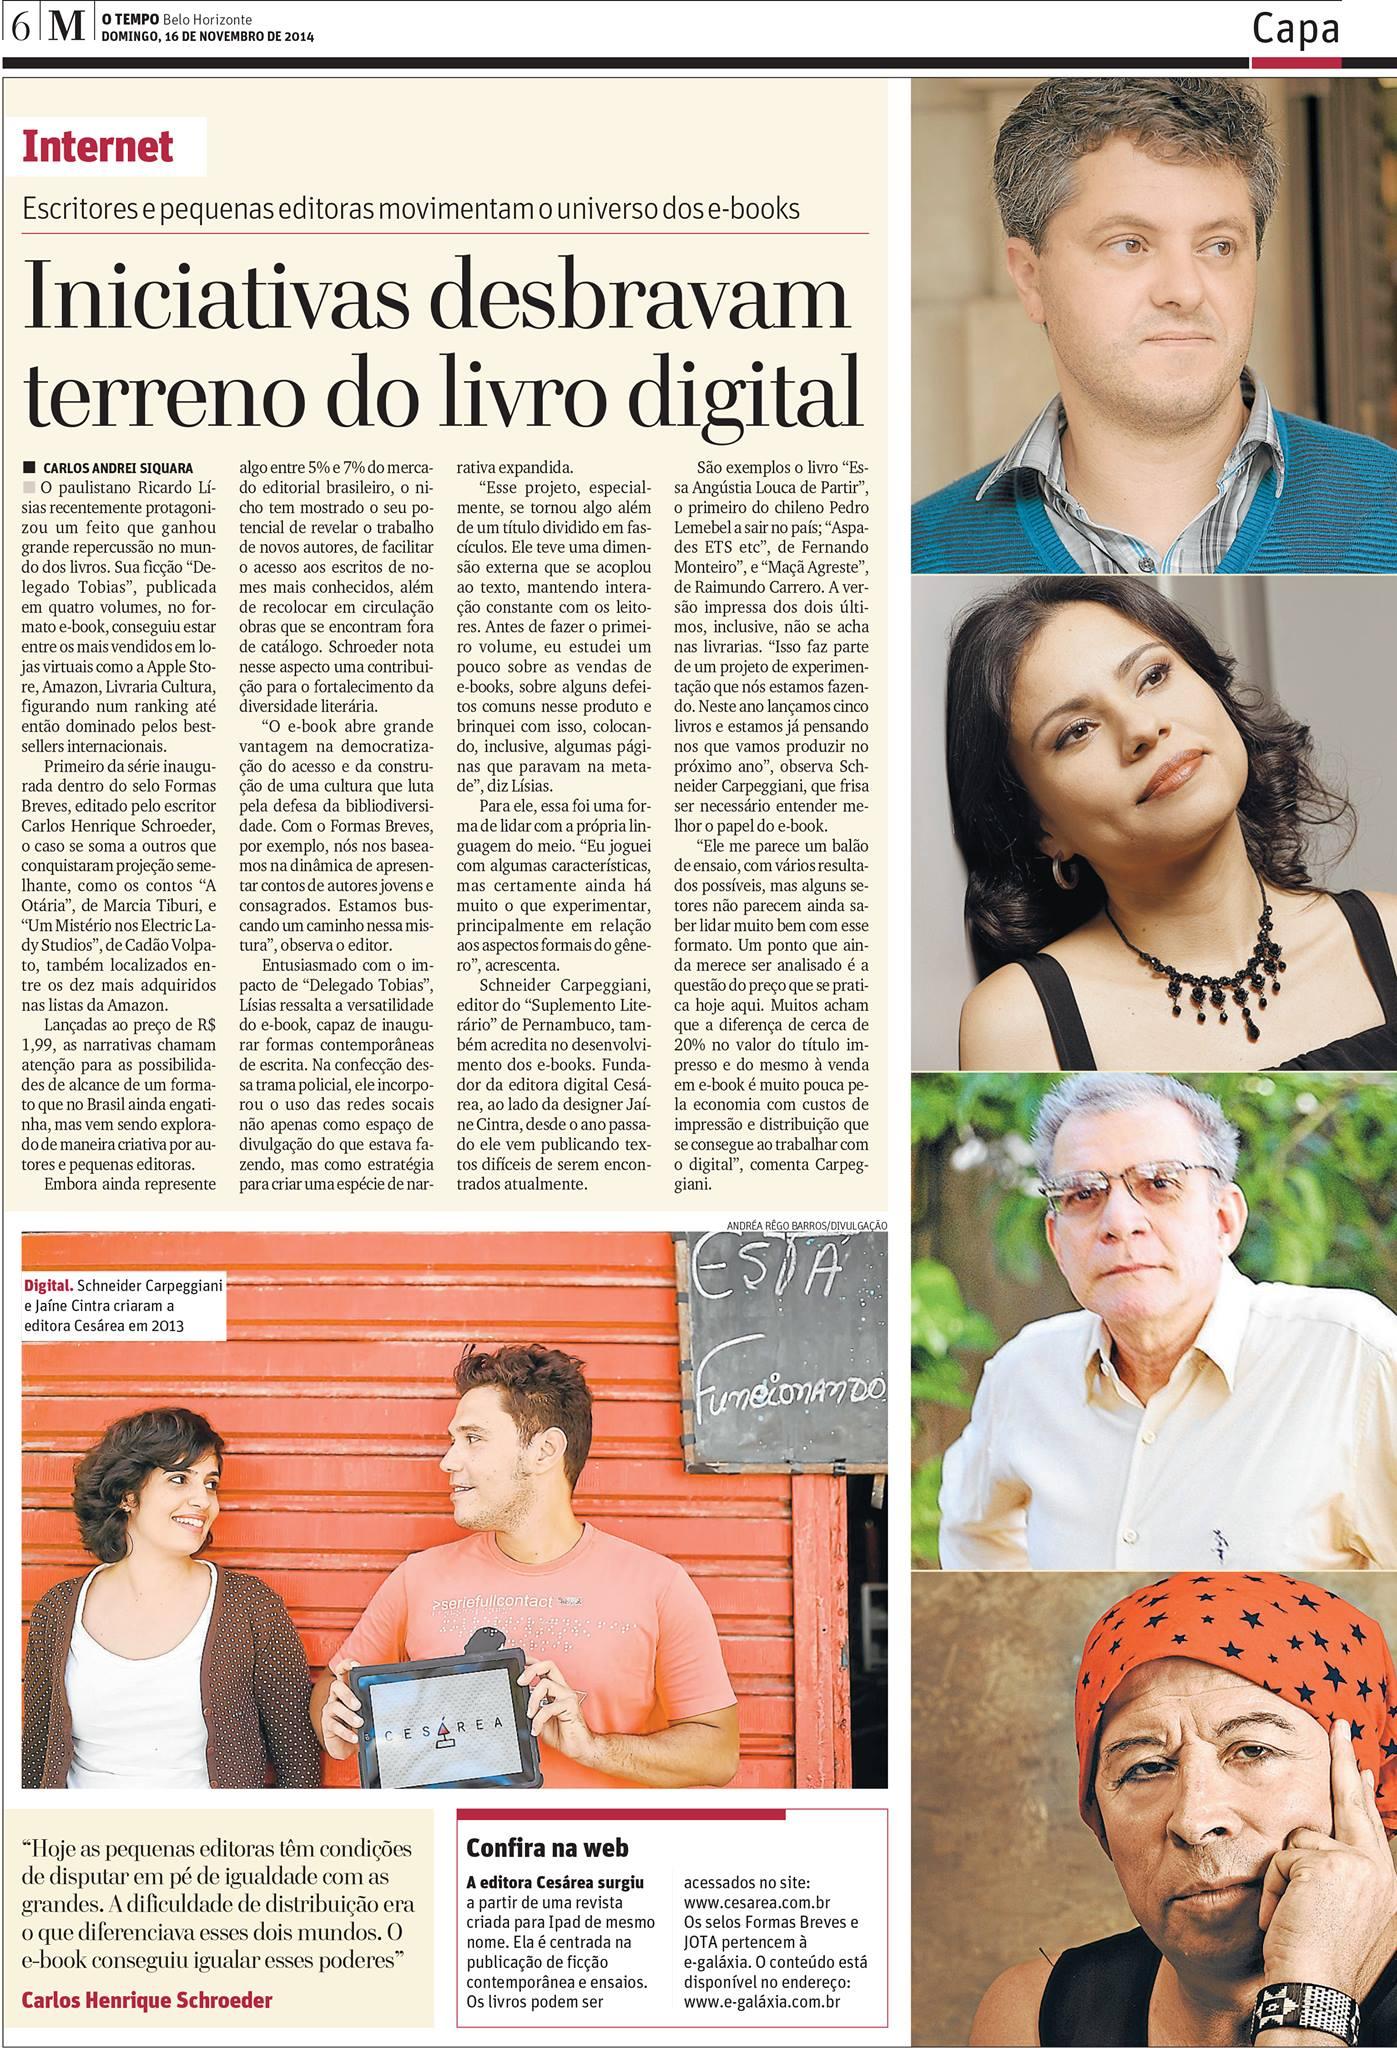 Iniciativas desbravam terreno do livro digital